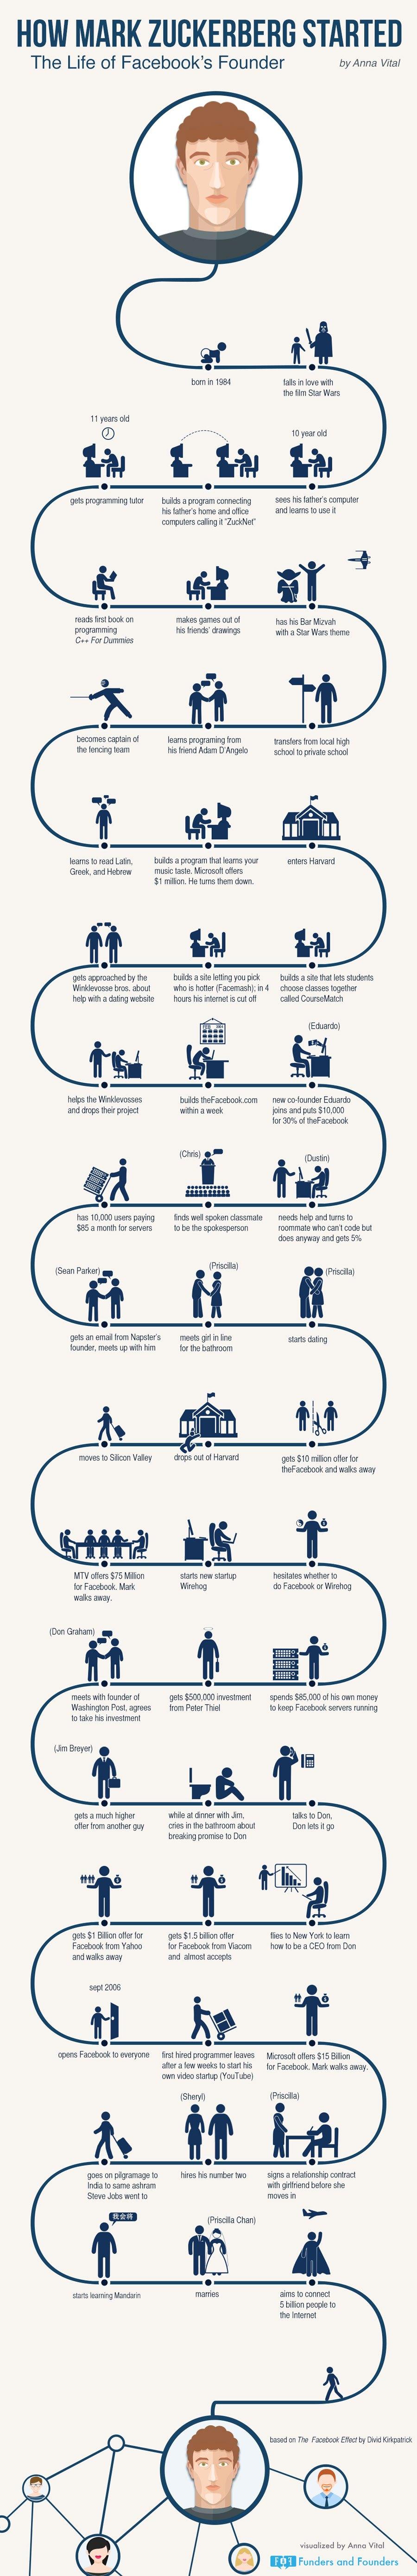 how-mark-zuckerberg-started-infographic